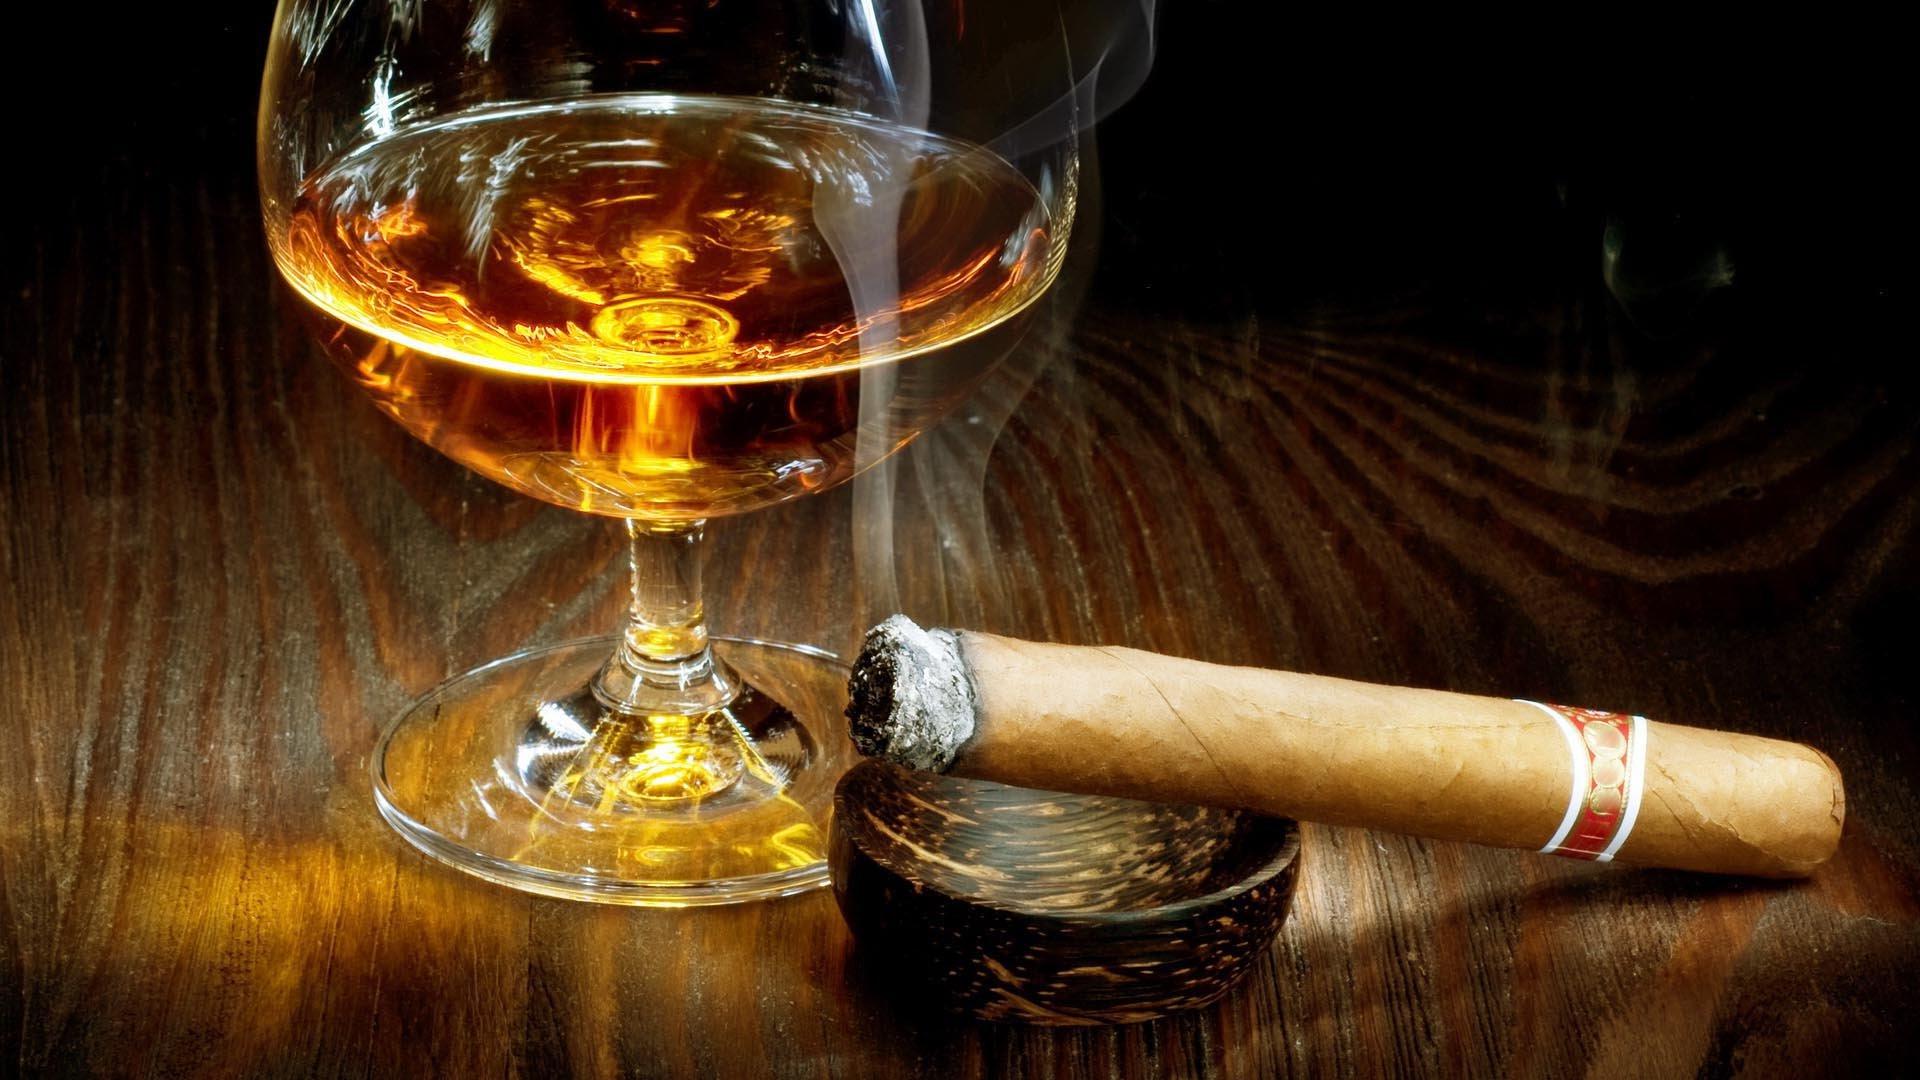 tobacco bokeh smoke smoking cigar drink alcohol drinks glass wallpaper 1920x1080